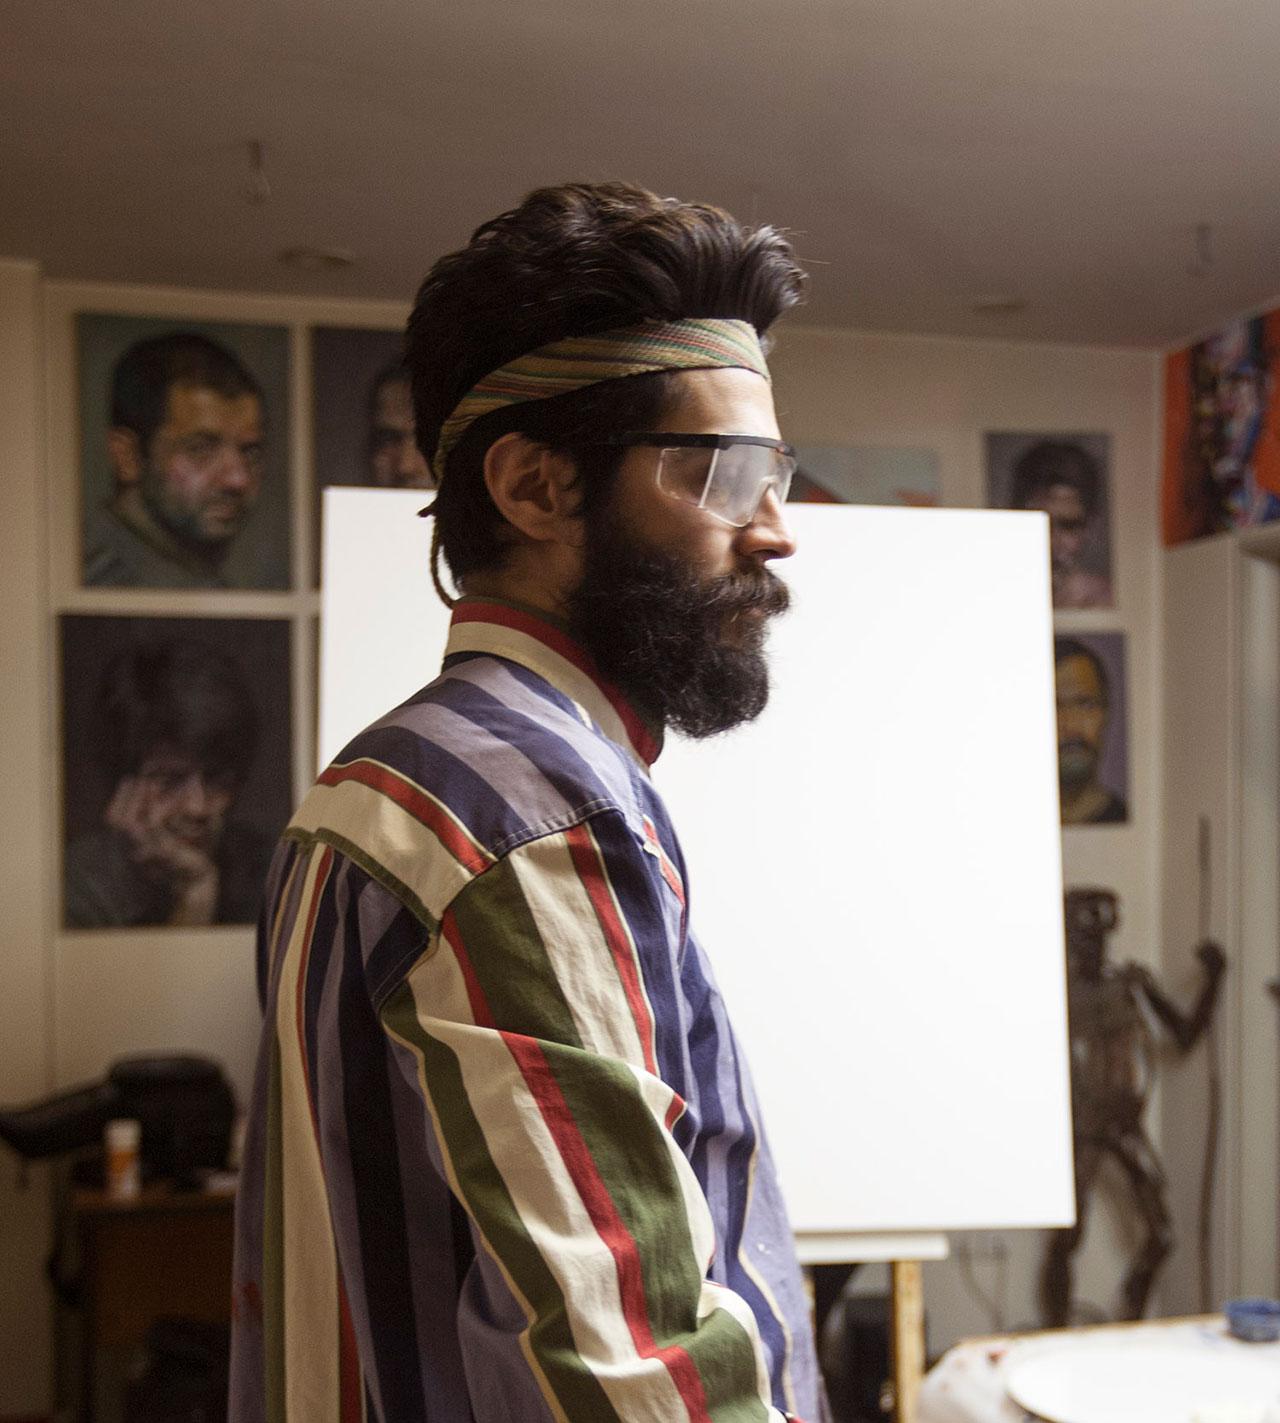 Salman Khoshroo portrait. Studio shot while working.